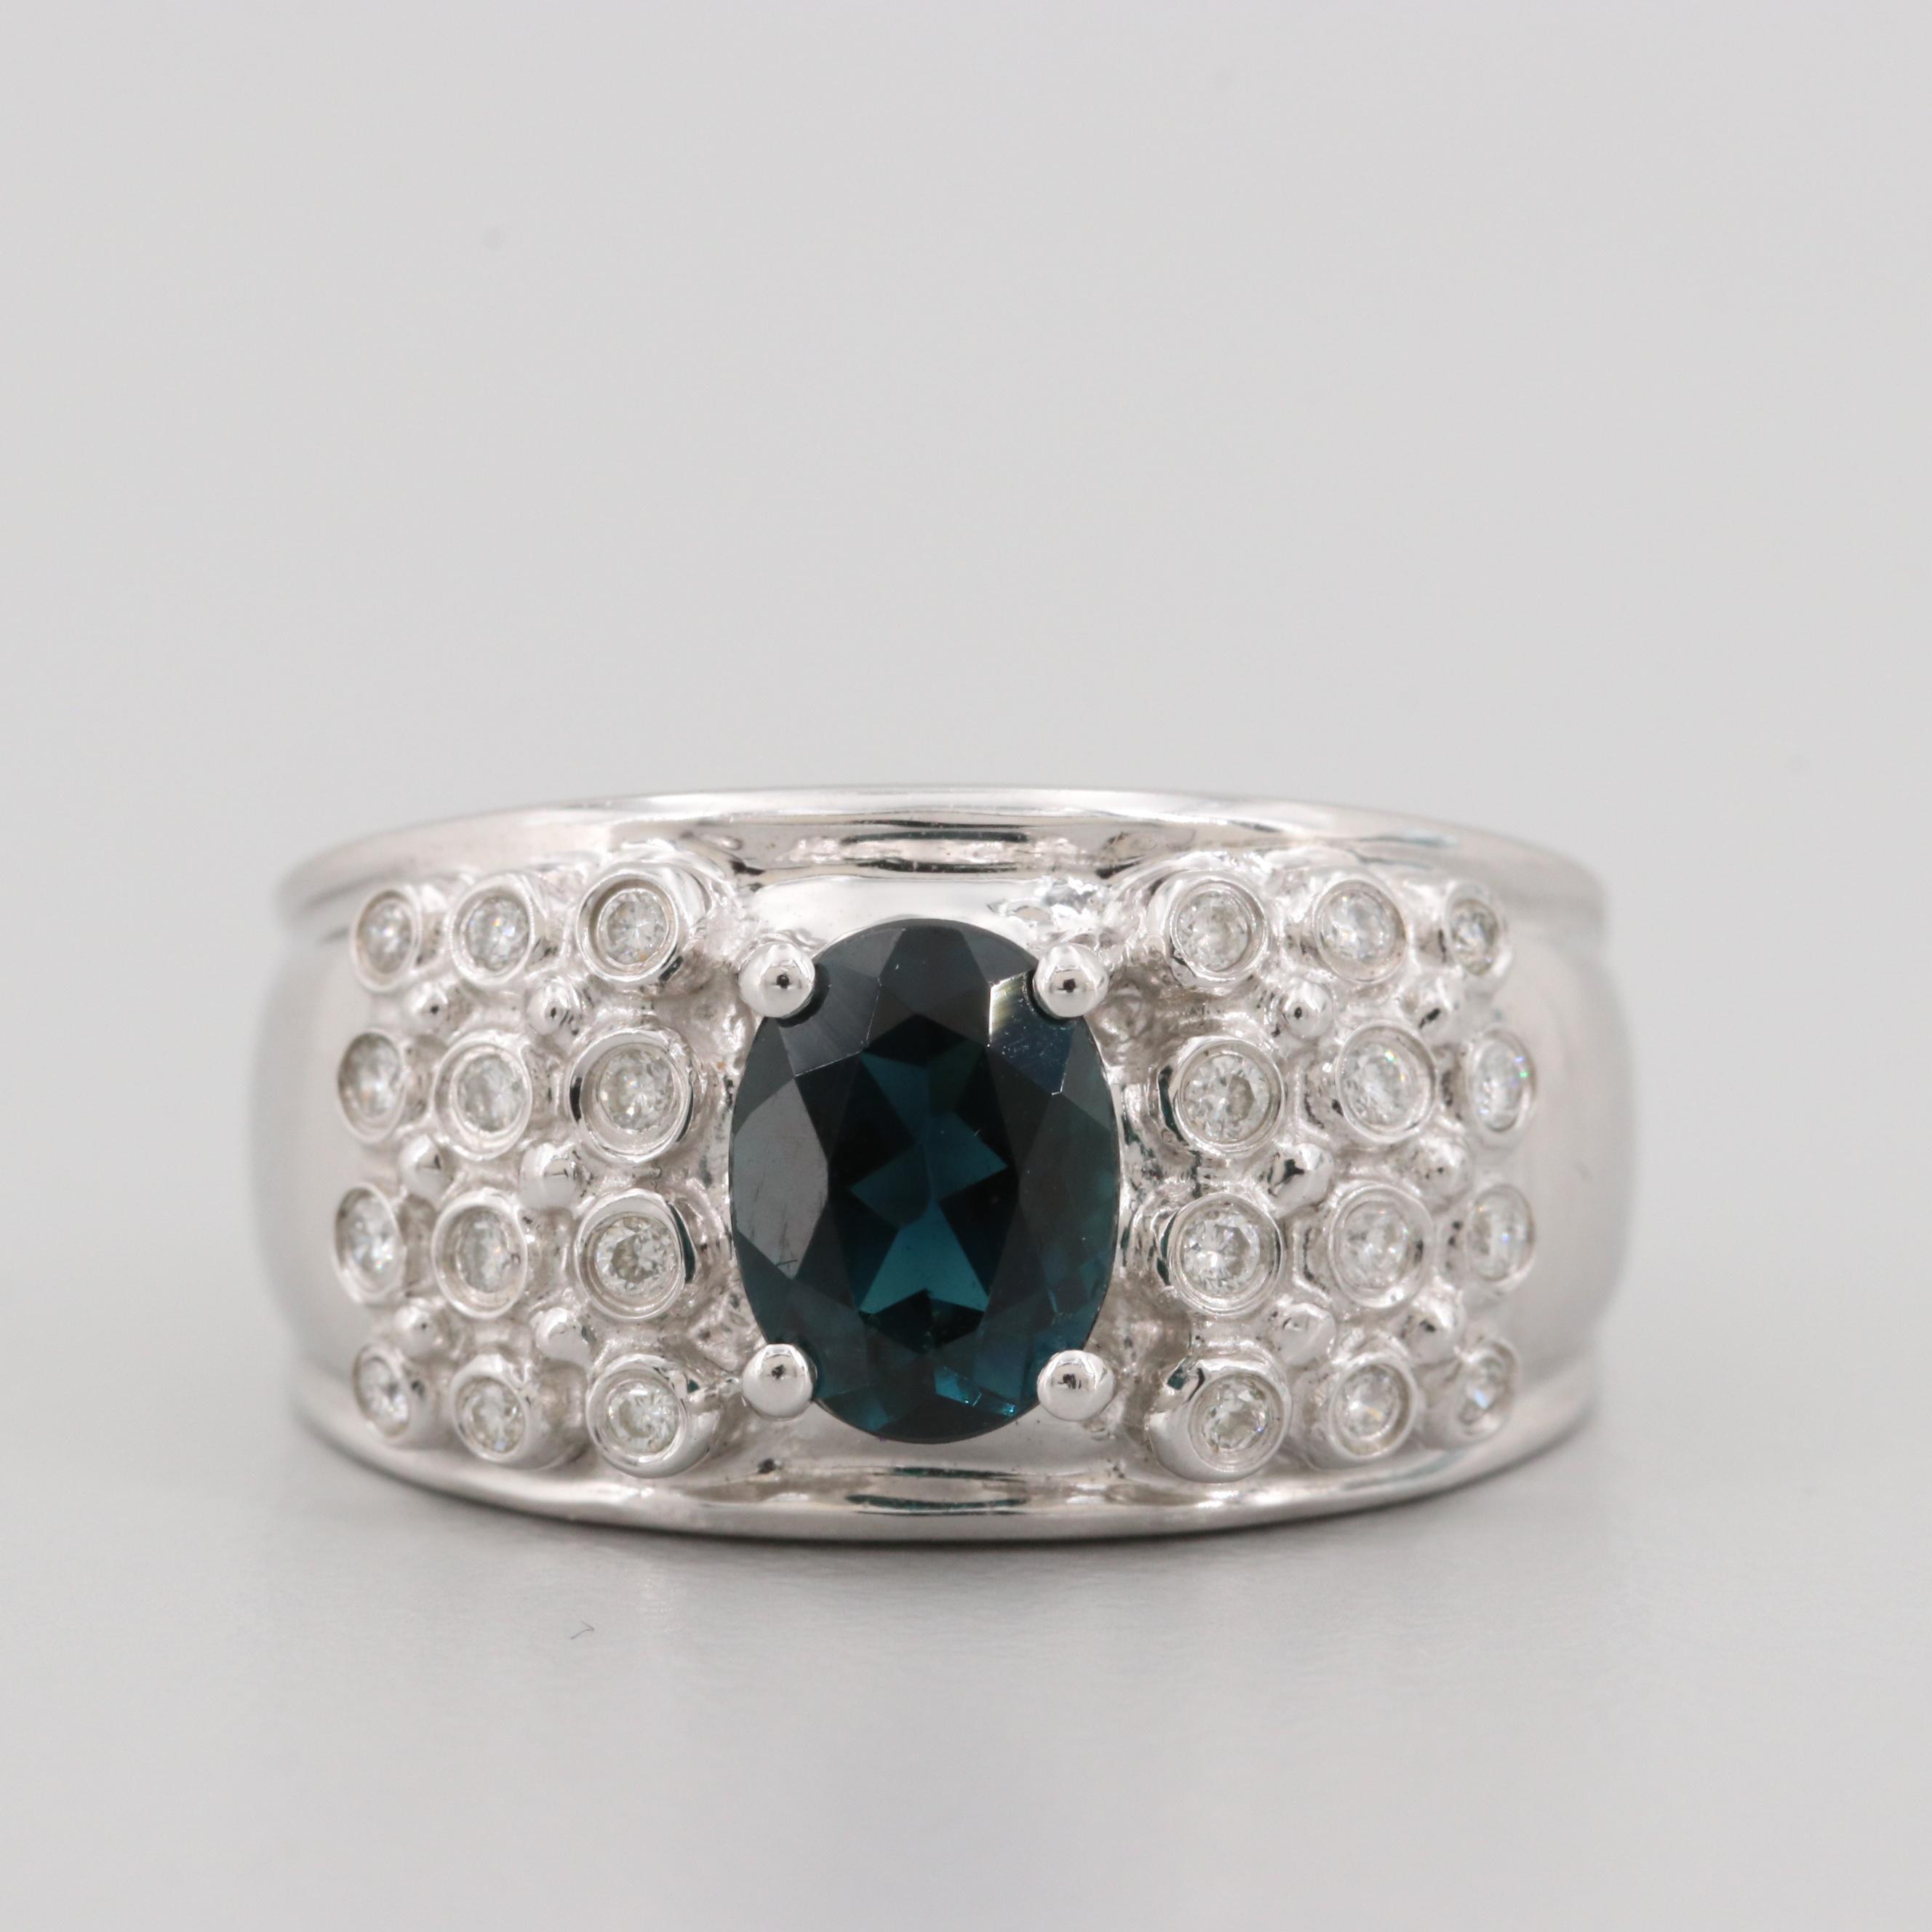 14K White Gold Indicolite and Diamond Ring